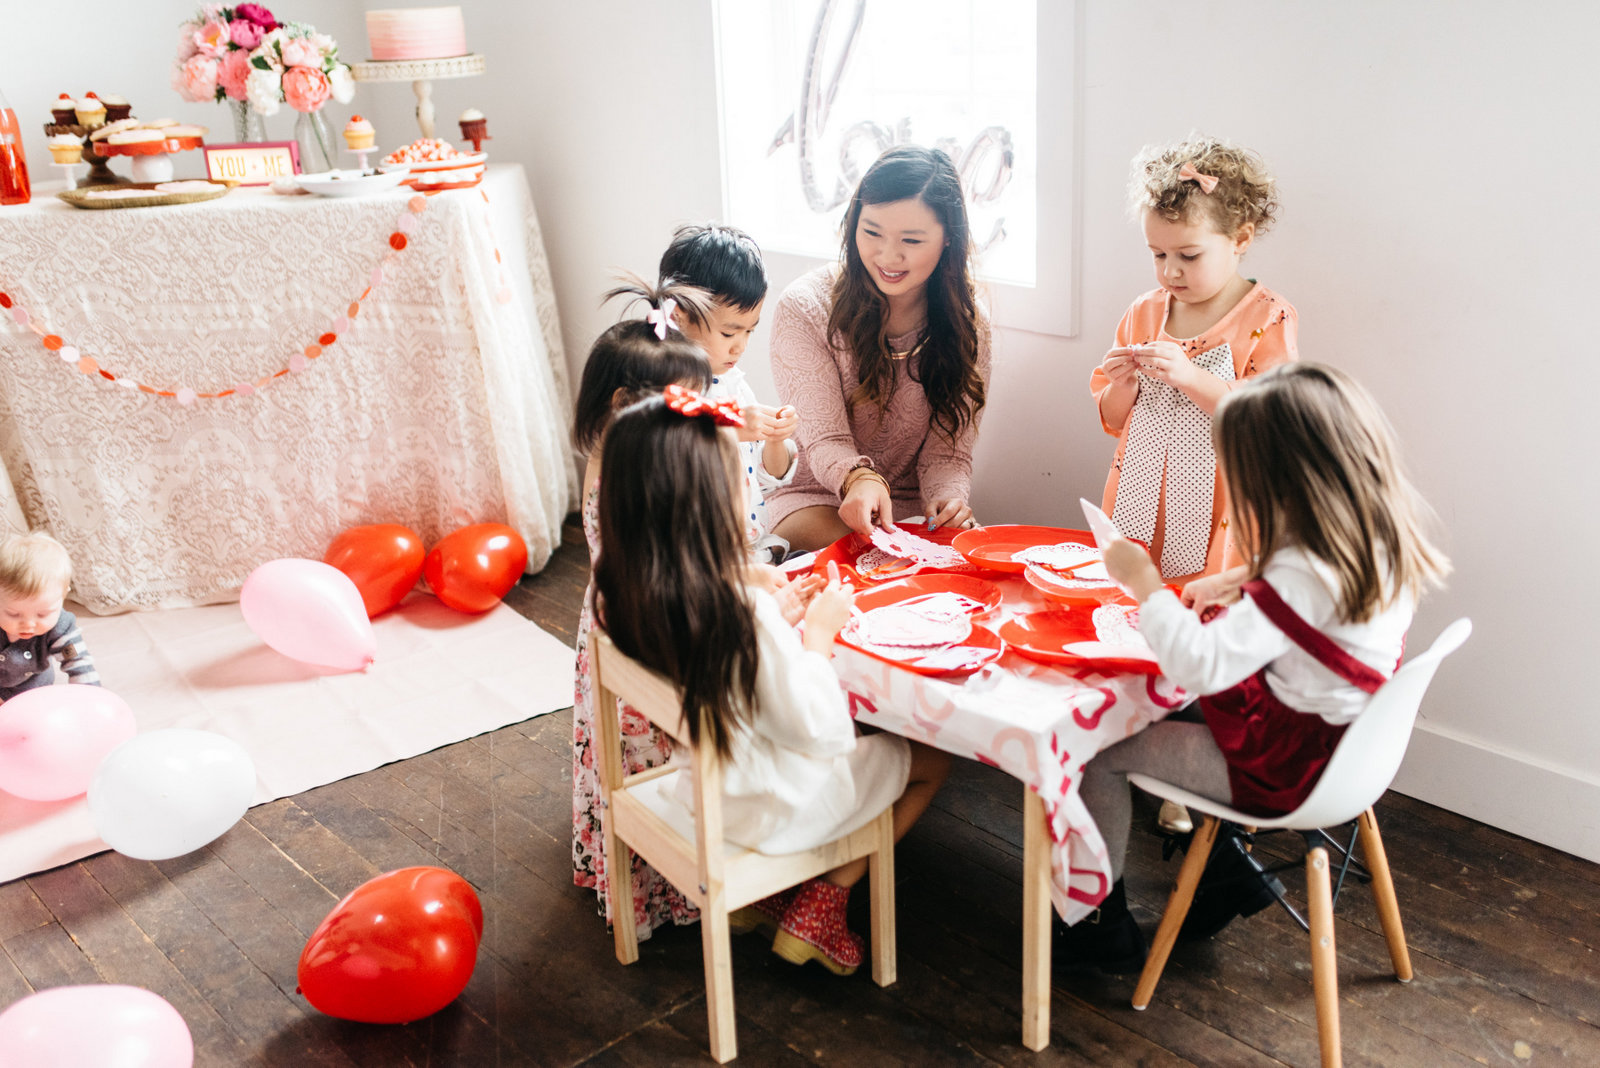 Family Valentine's Party Ideas